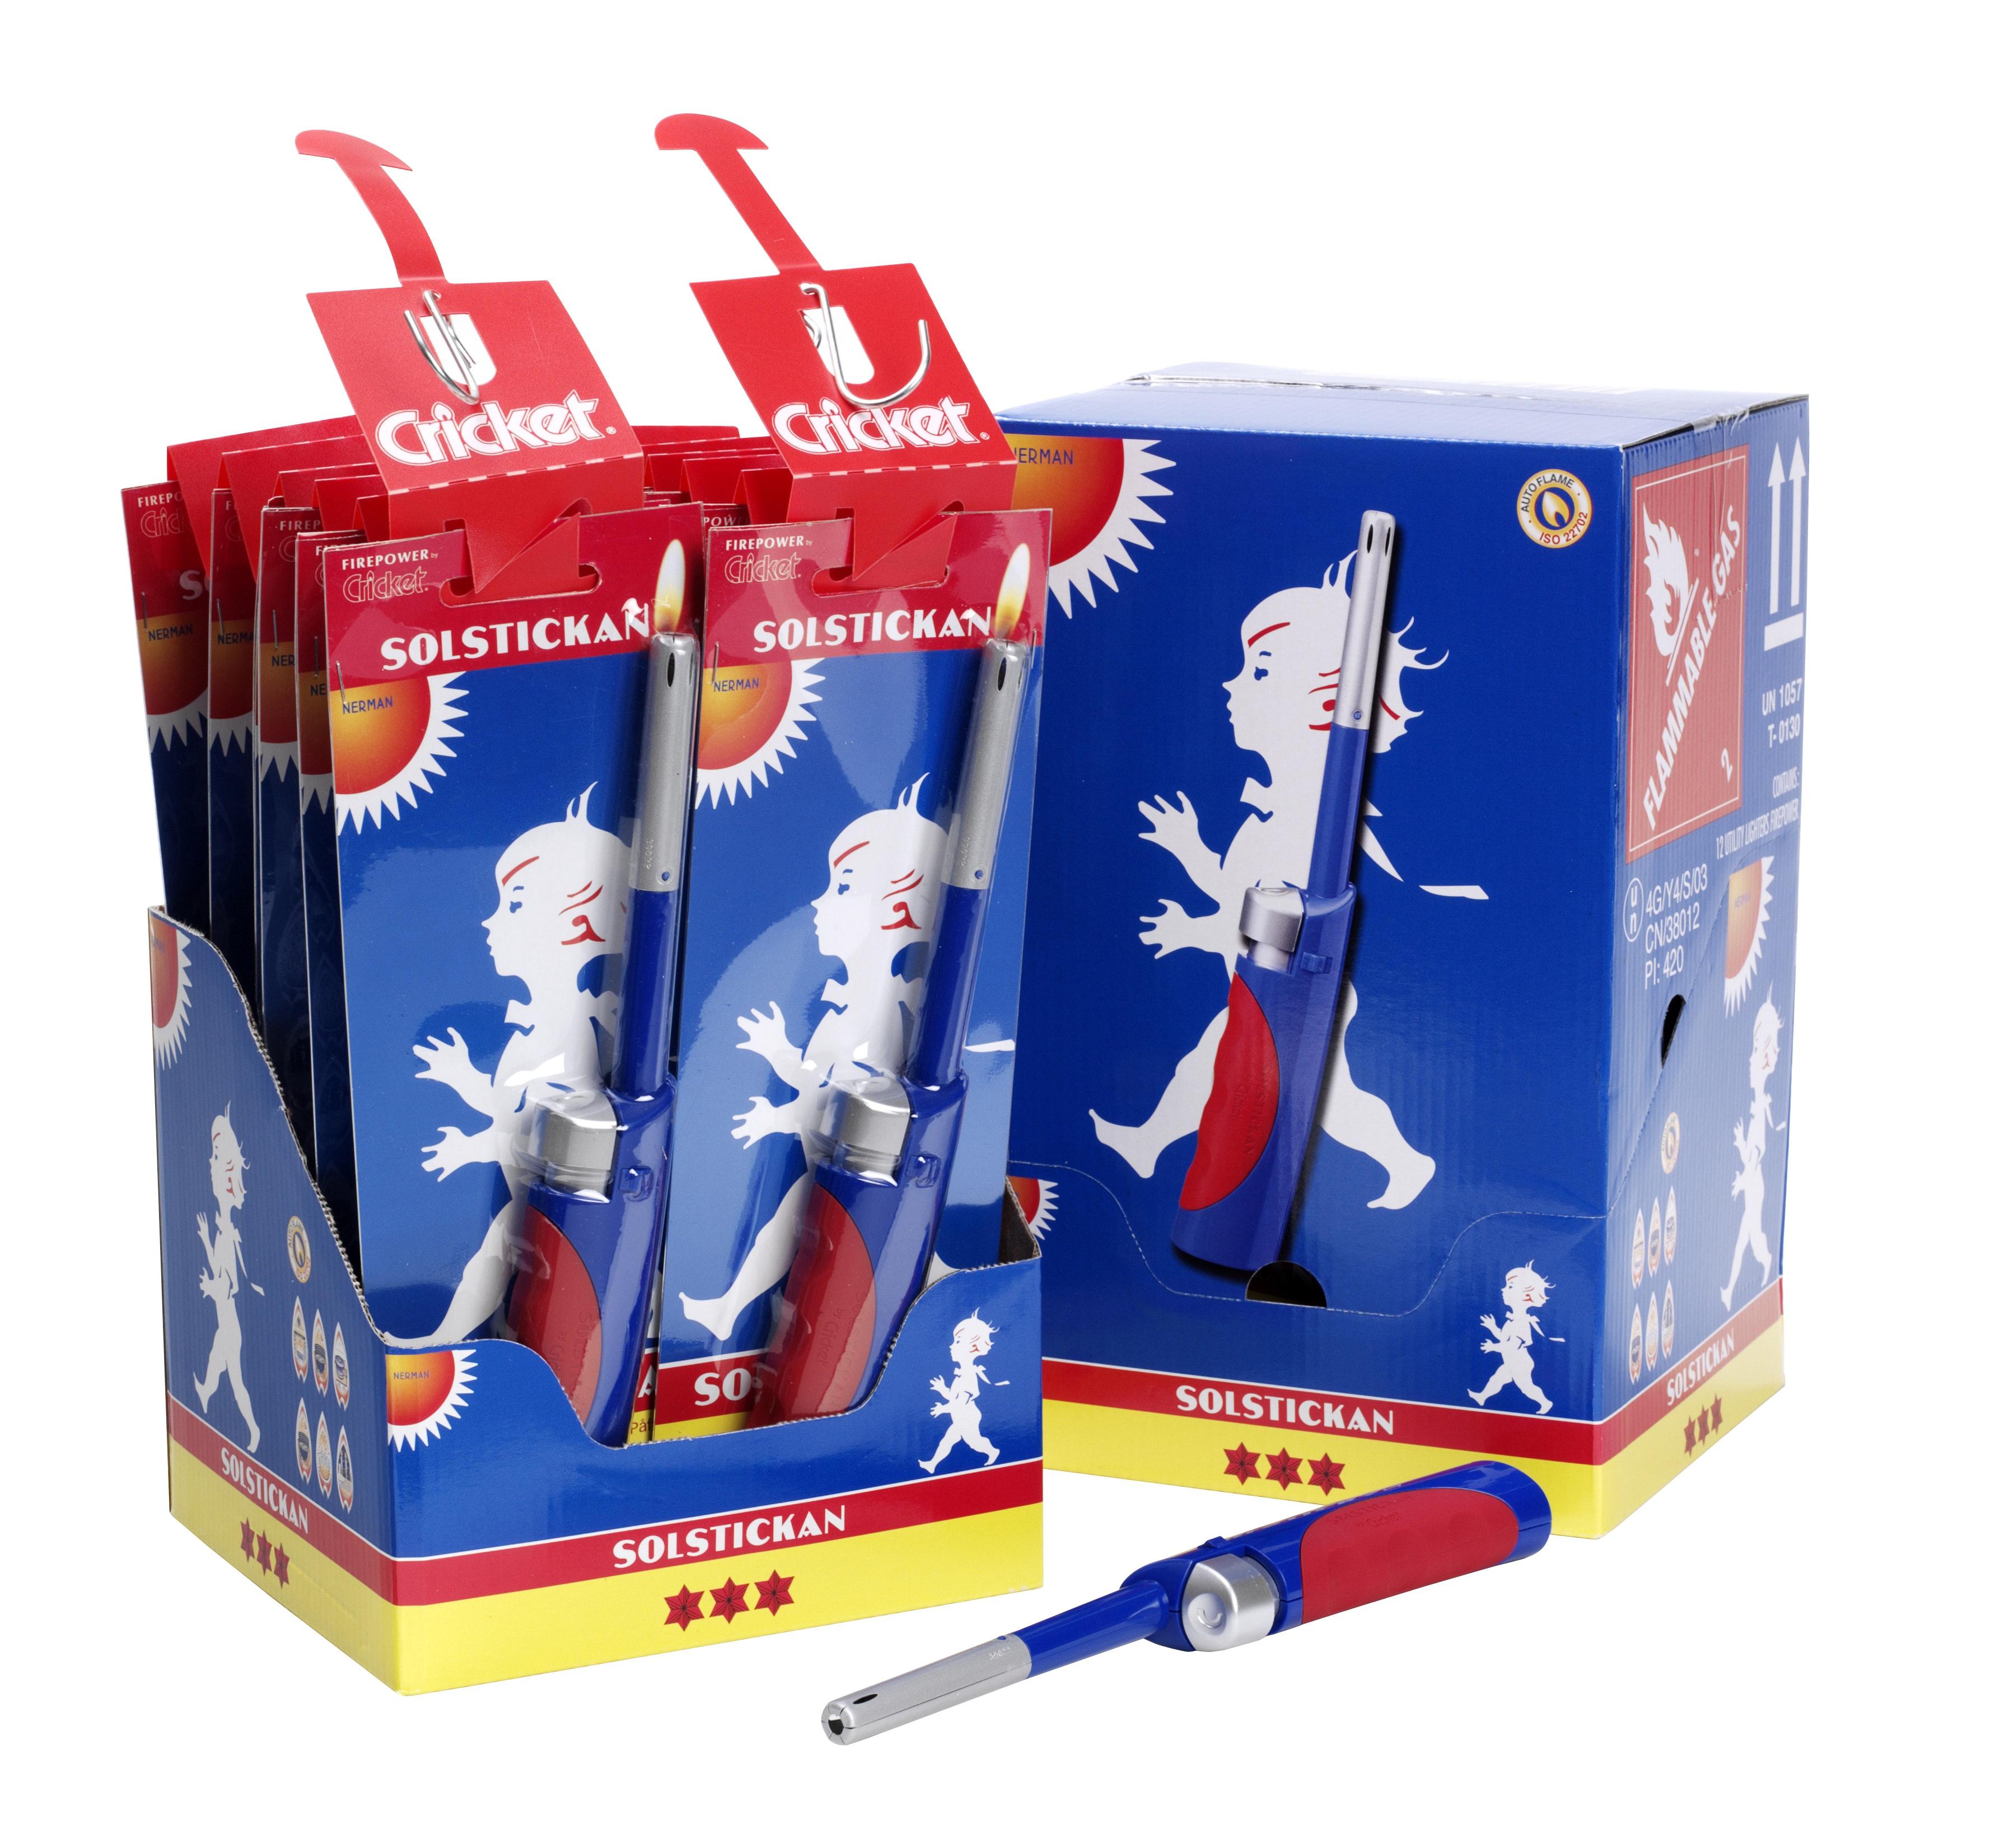 Tändare Cricket 1-Pack